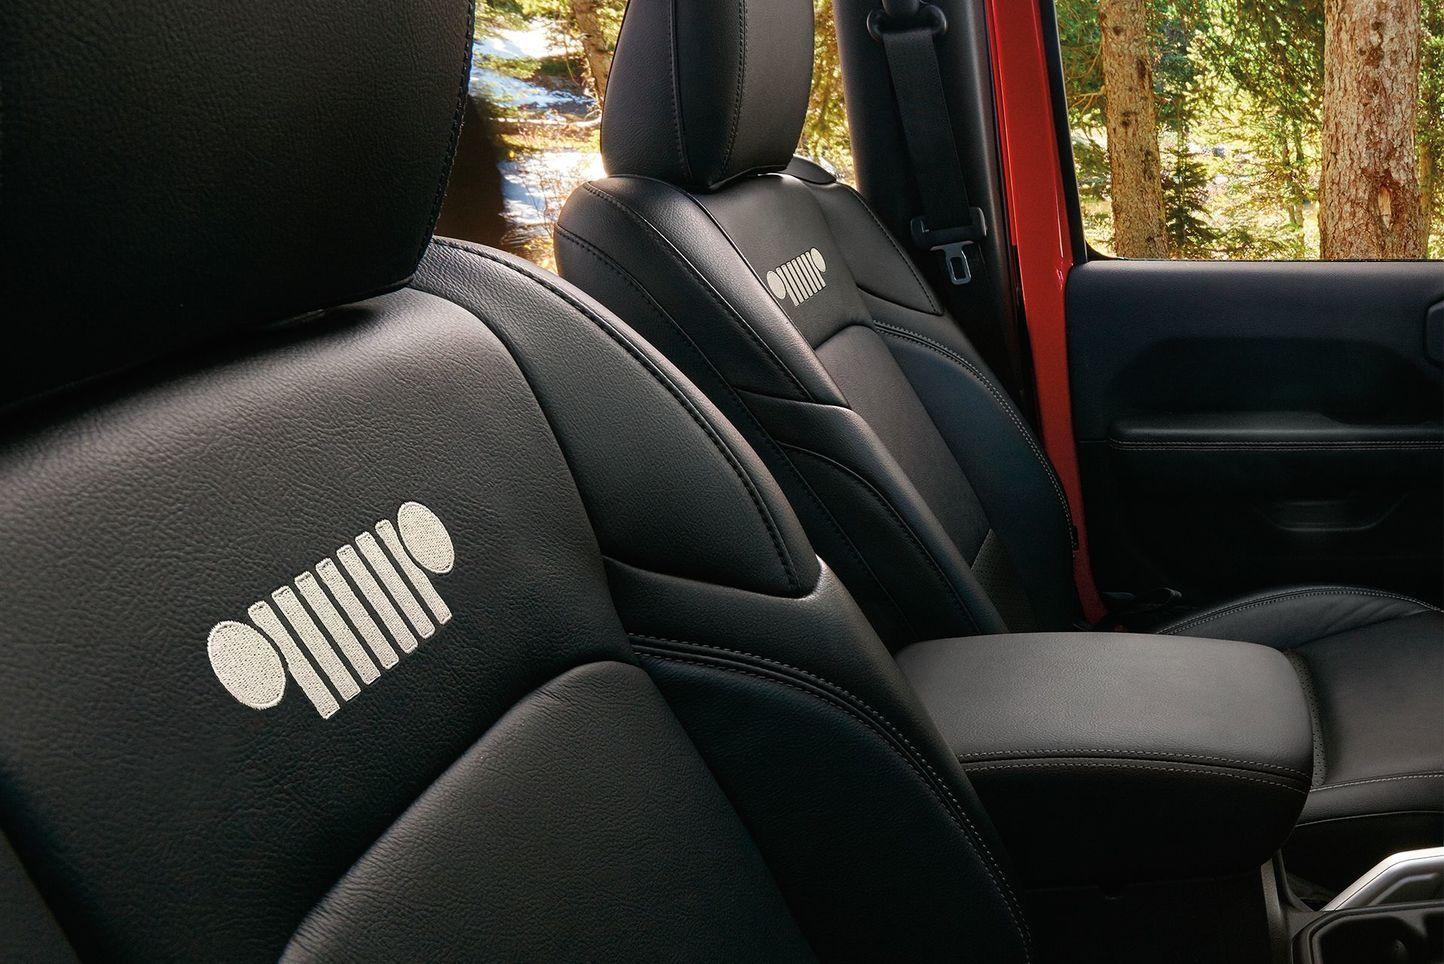 2018 Jeep Wrangler Jl Leather Interior With Mopar Accessories Jeep Wrangler Interior Wrangler Jl Jeep